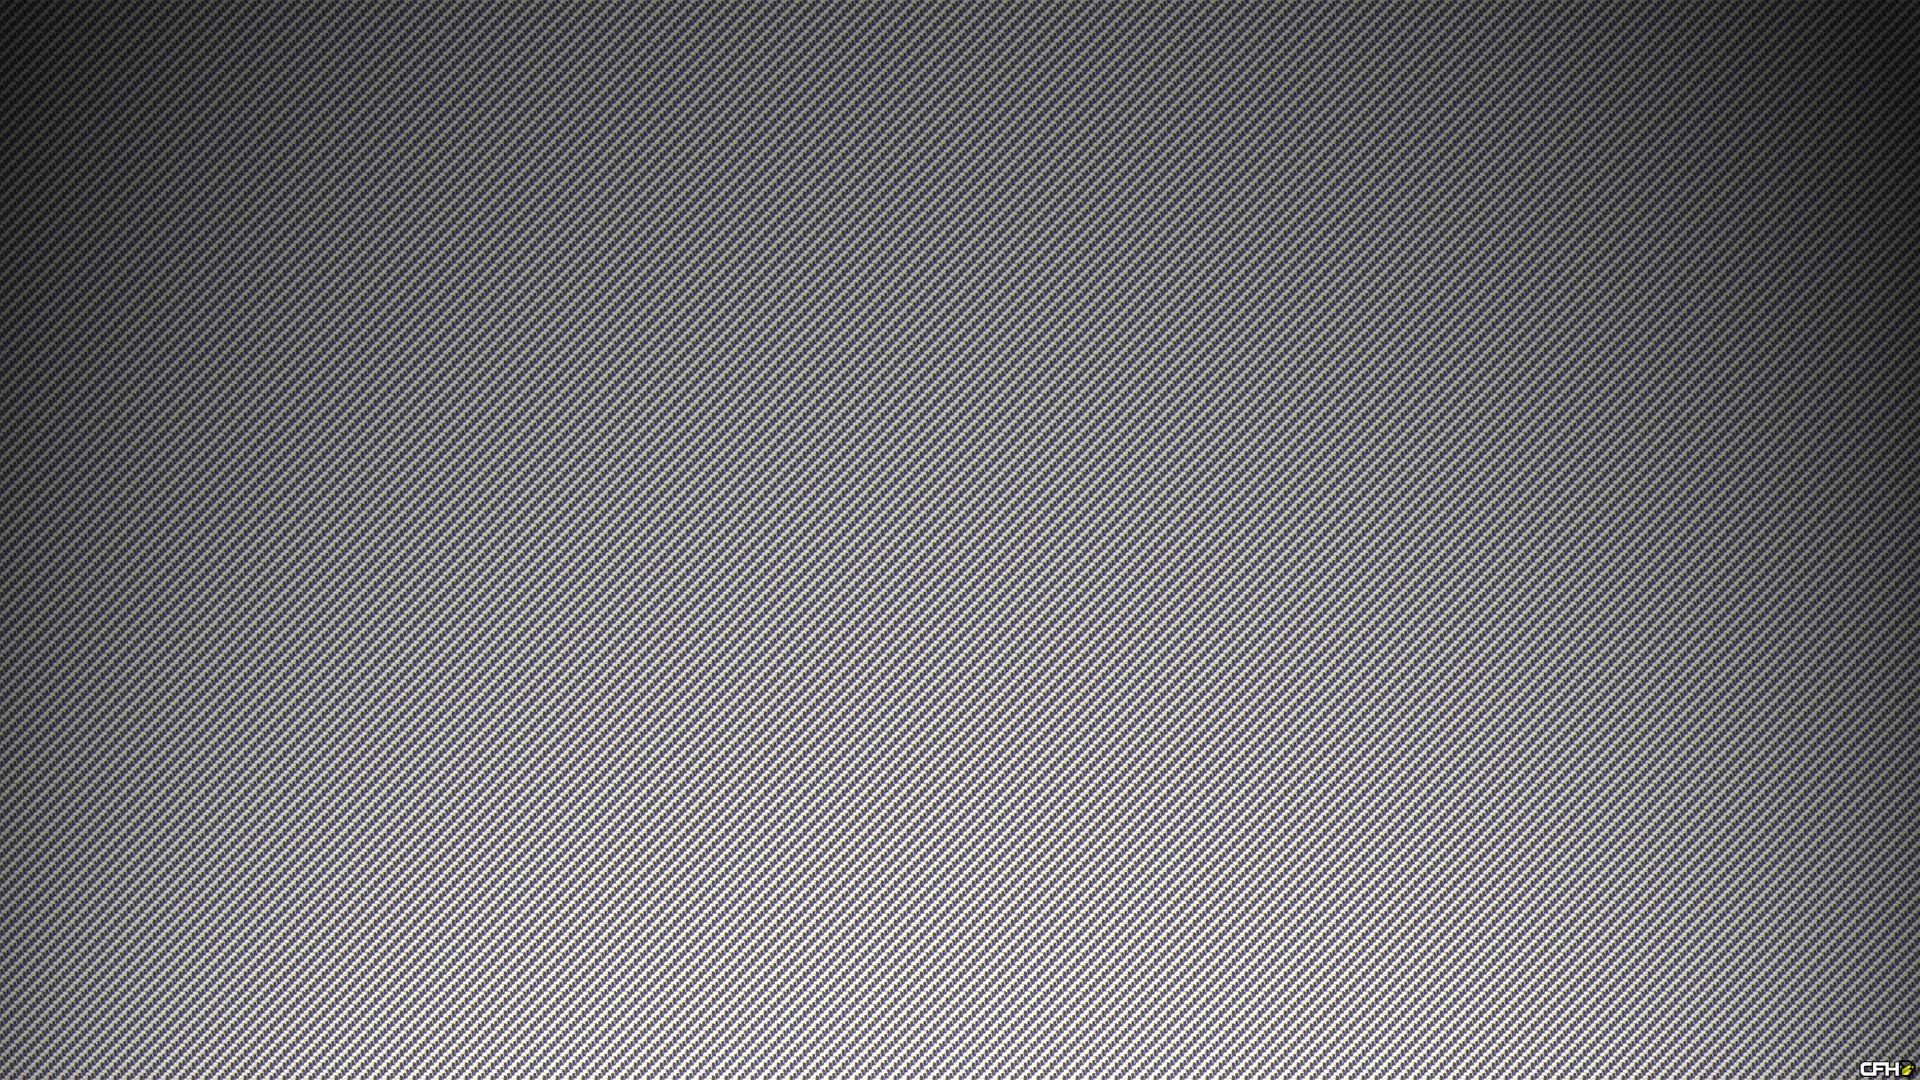 carbon-fiber-backgrounds-jTPc